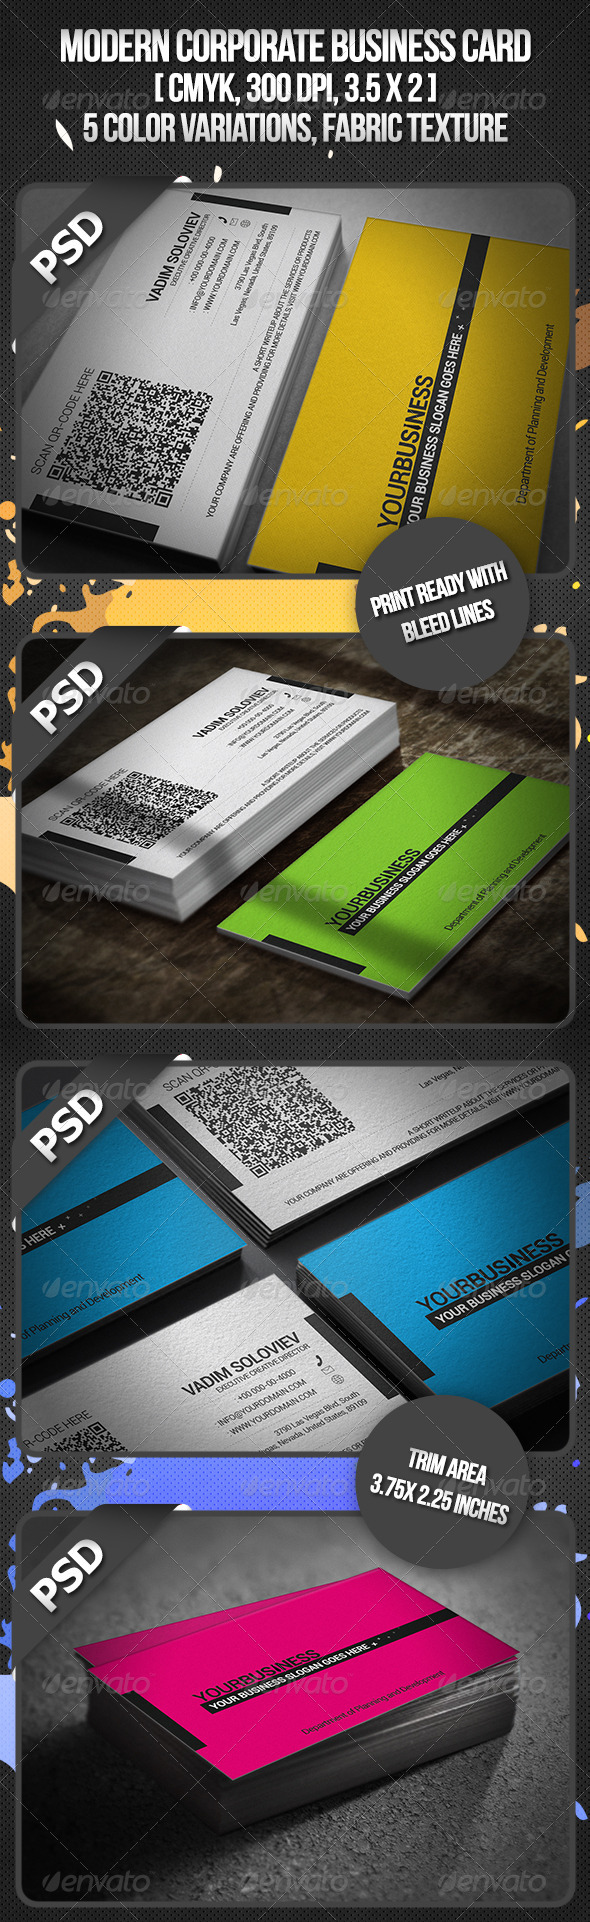 Modern Corporate Business Card - Corporate Business Cards